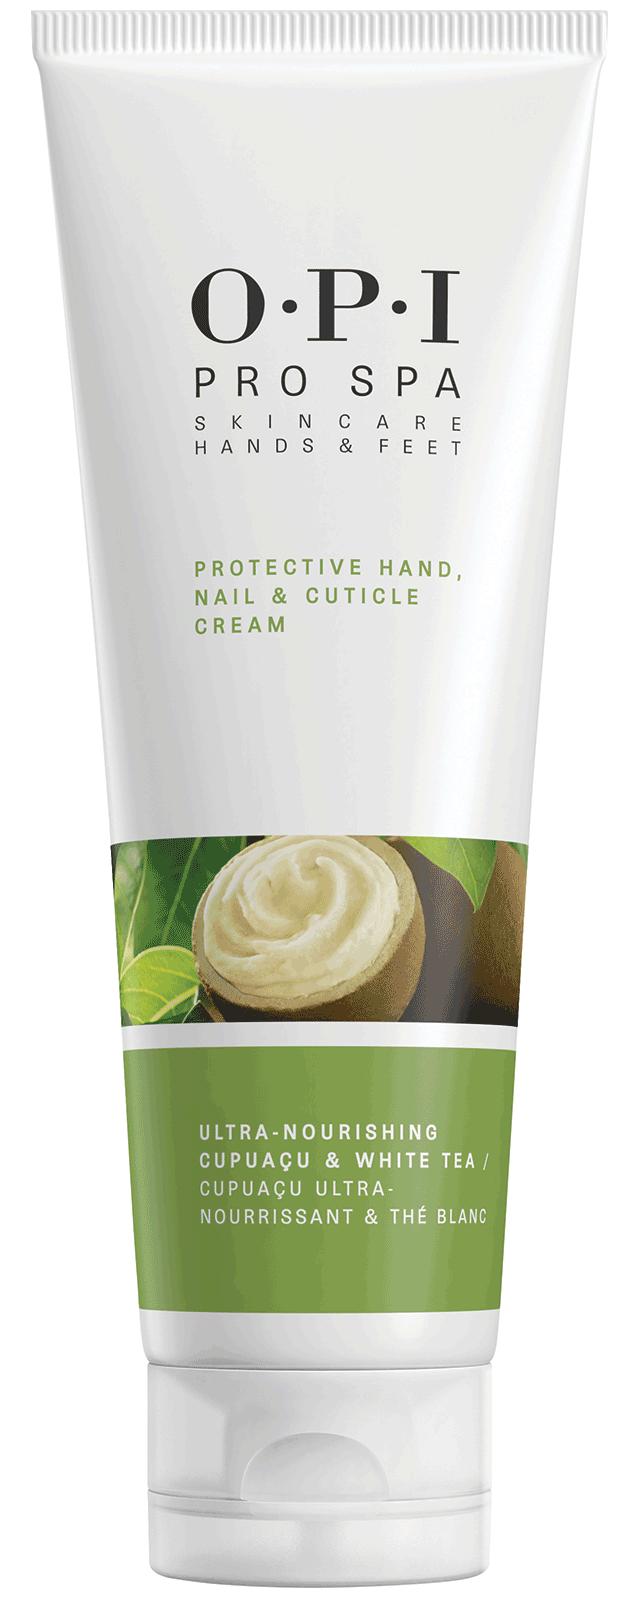 OPI Крем защитный для рук, ногтей и кутикулы / PRO SPA 118мл opi лосьон для рук и тела opi avoplex moisture replenishing lotion av711 30 мл